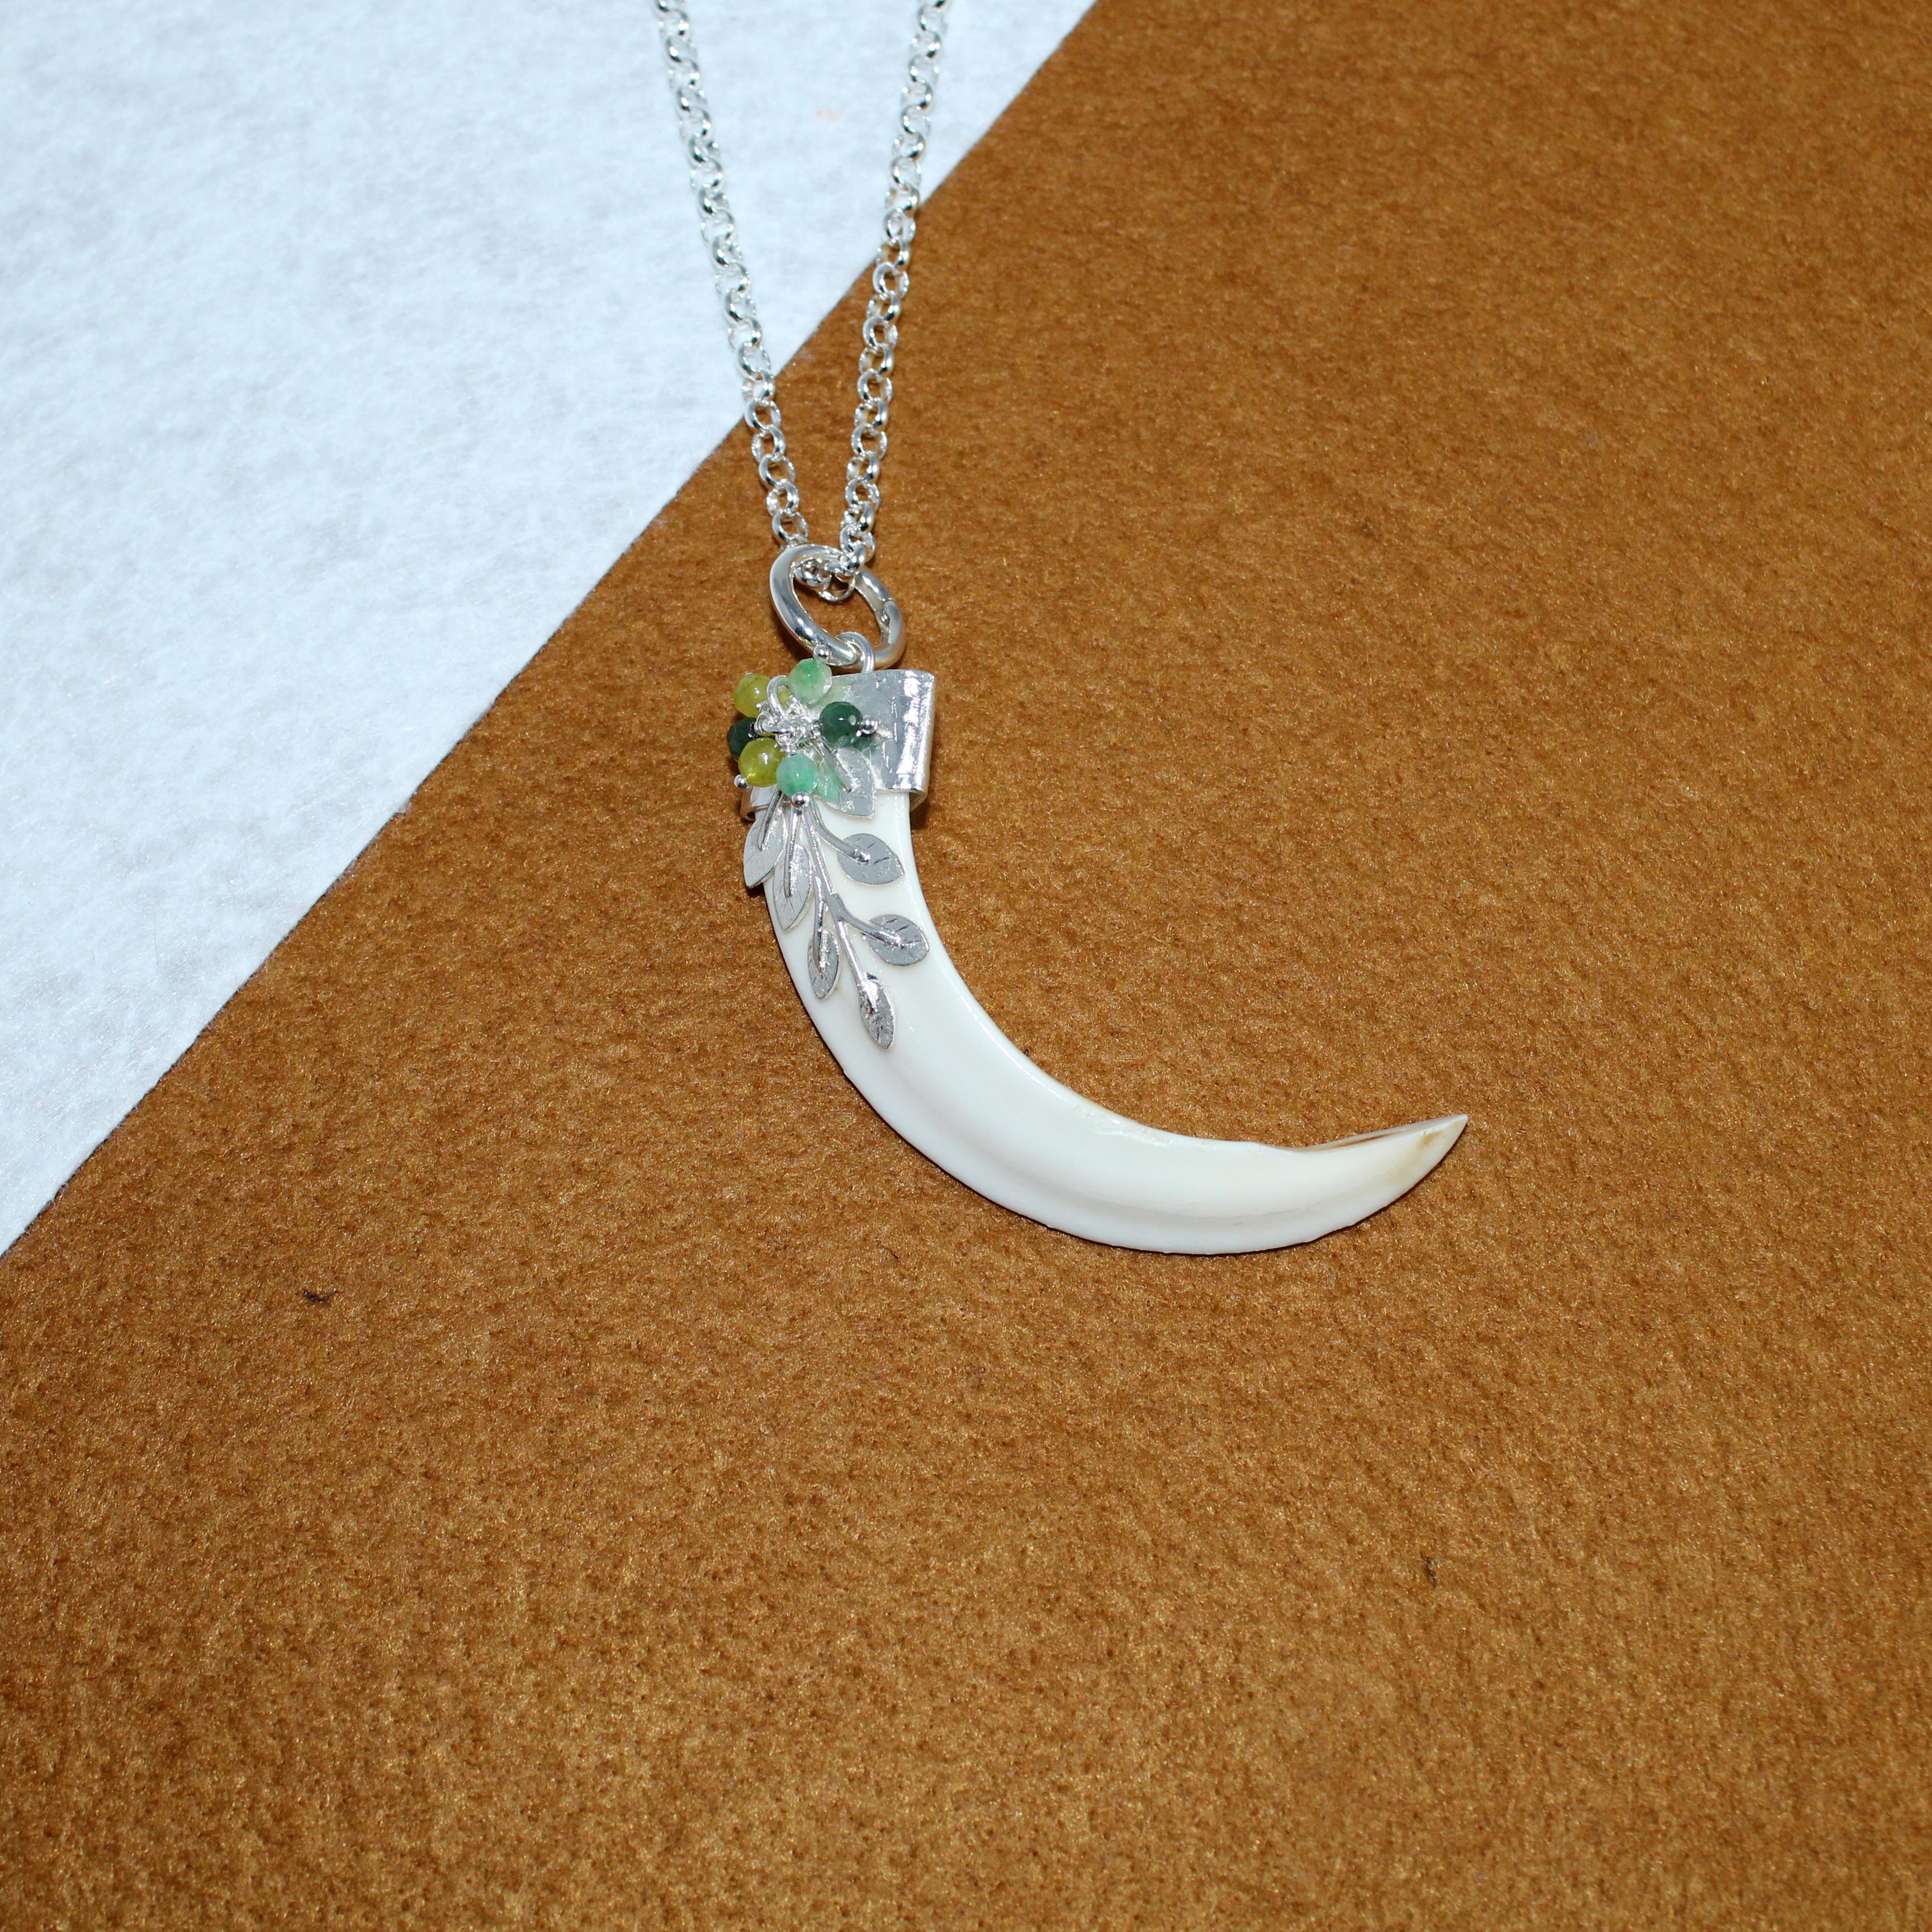 Colmillo de jabalí montado en plata 925 con detalle de hojas y ágatas joyas de caza